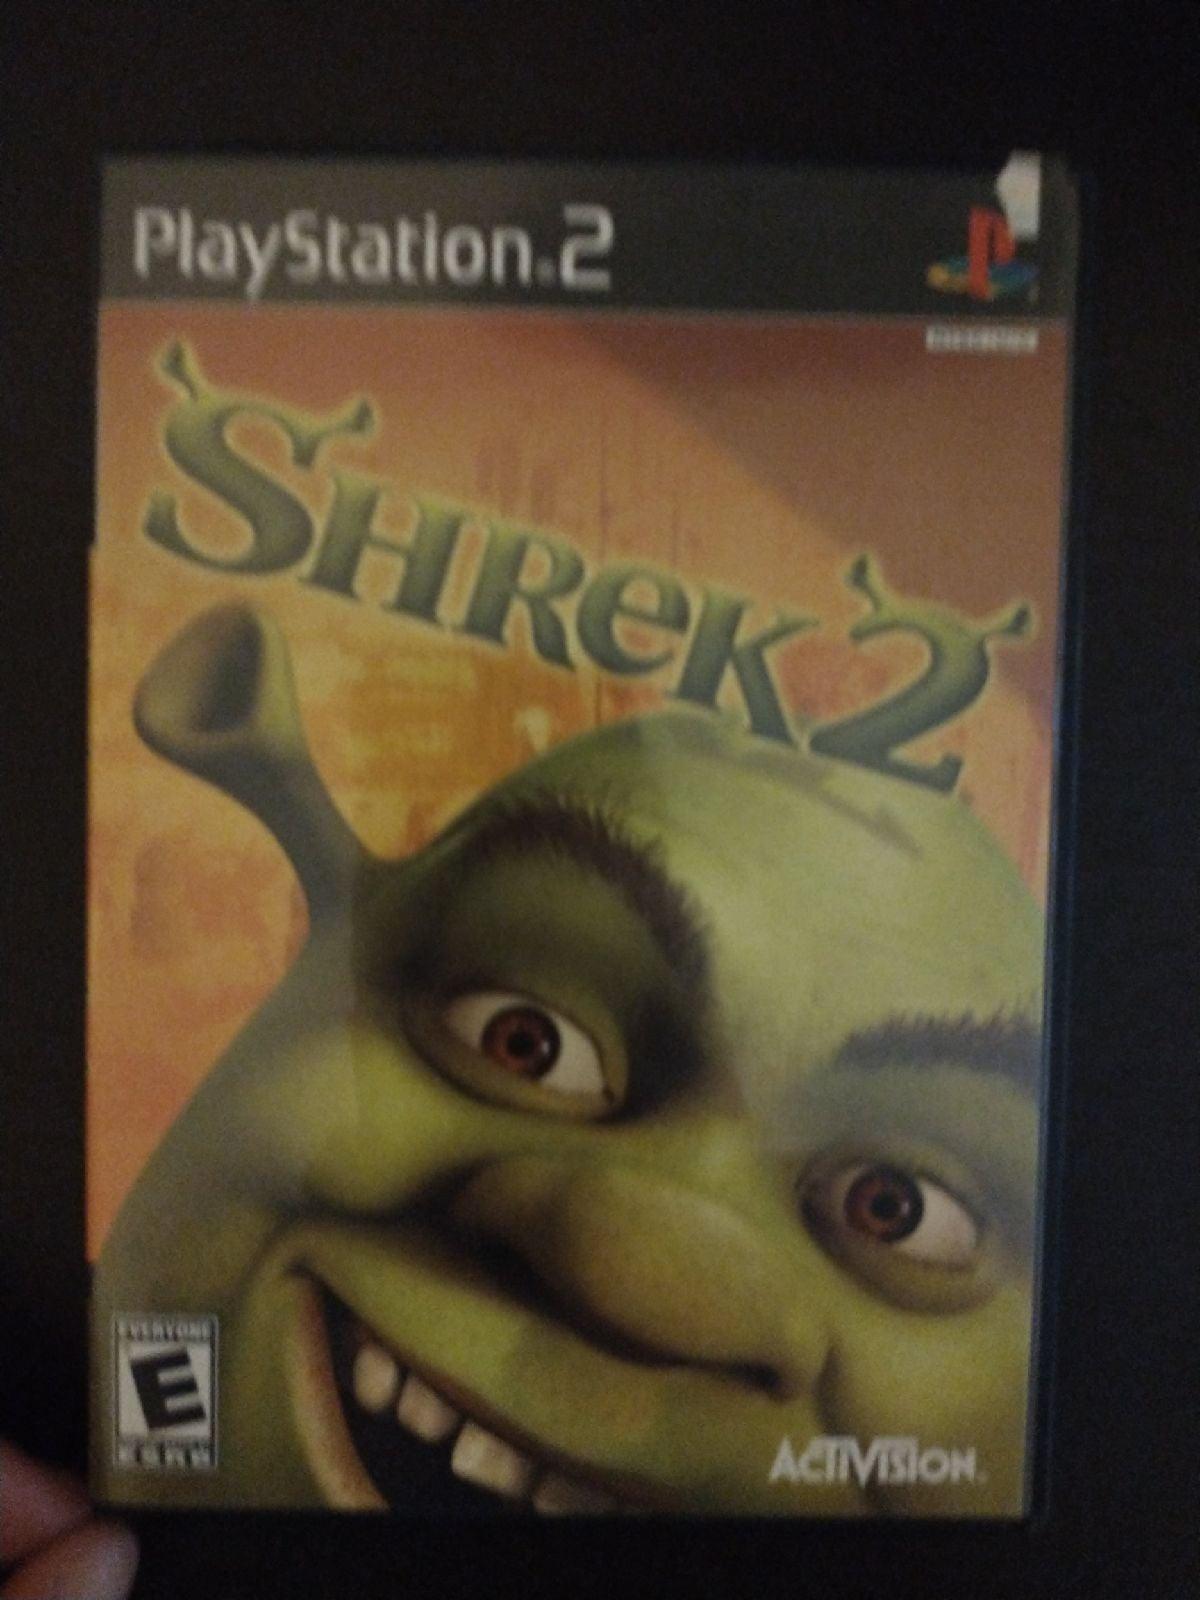 Shrek 2 on Playstation 2